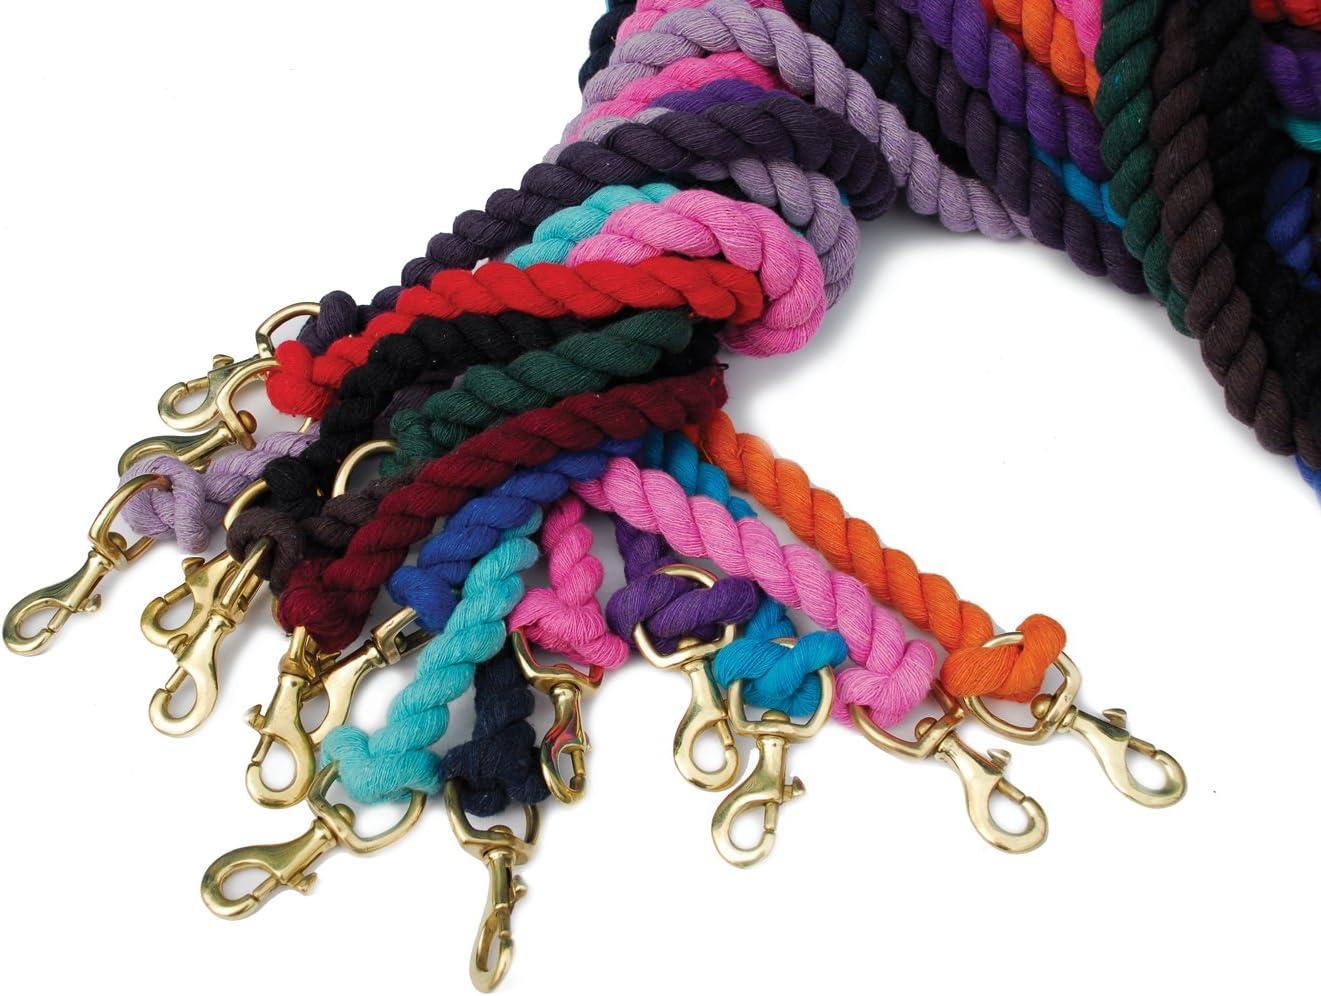 Black One Size Rhinegold Unisexs Cotton Lead Rope